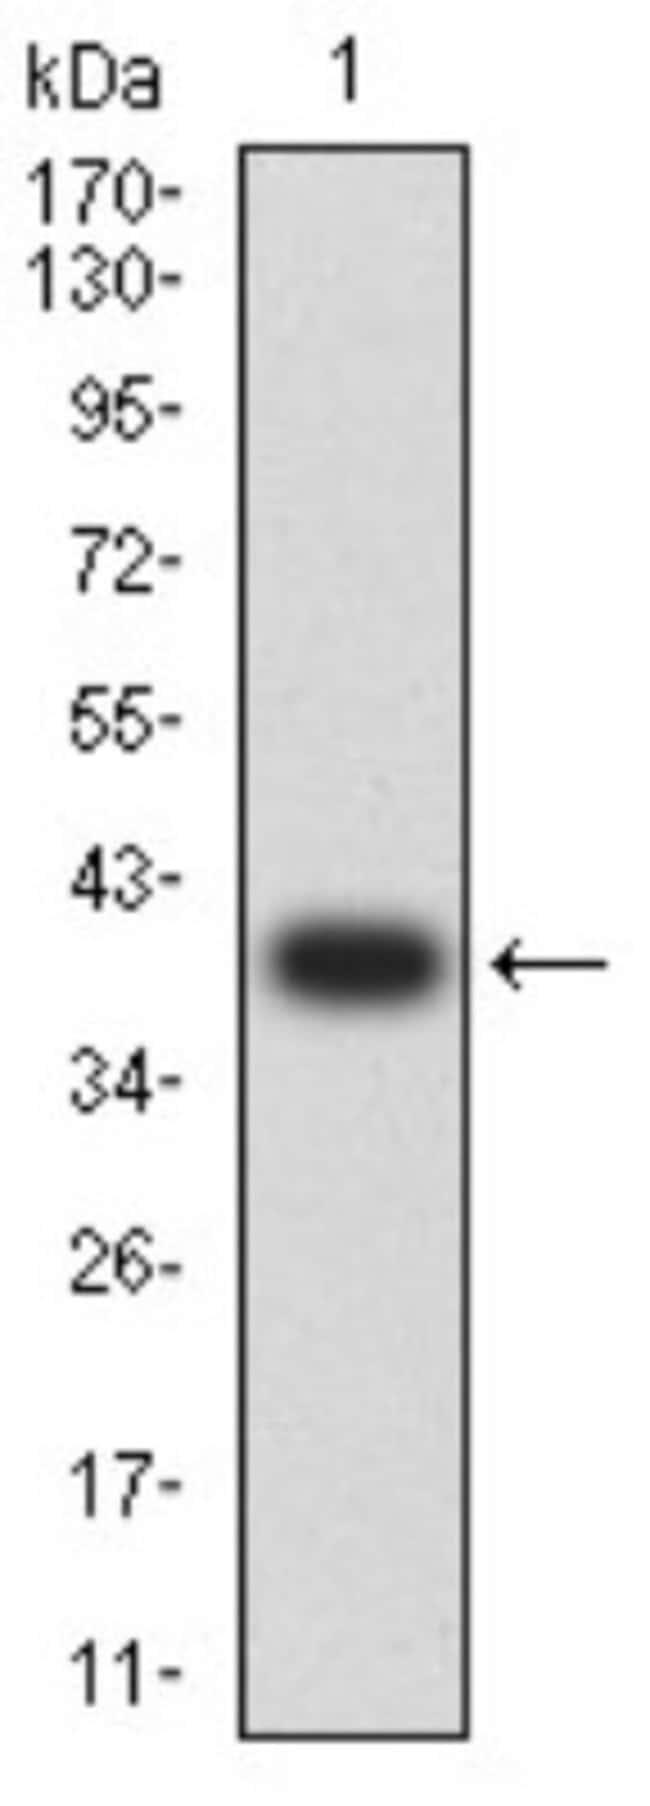 KA2/GRIK5/Glutamate Receptor KA2 Mouse anti-Human, Clone: 4G5H8, Novus